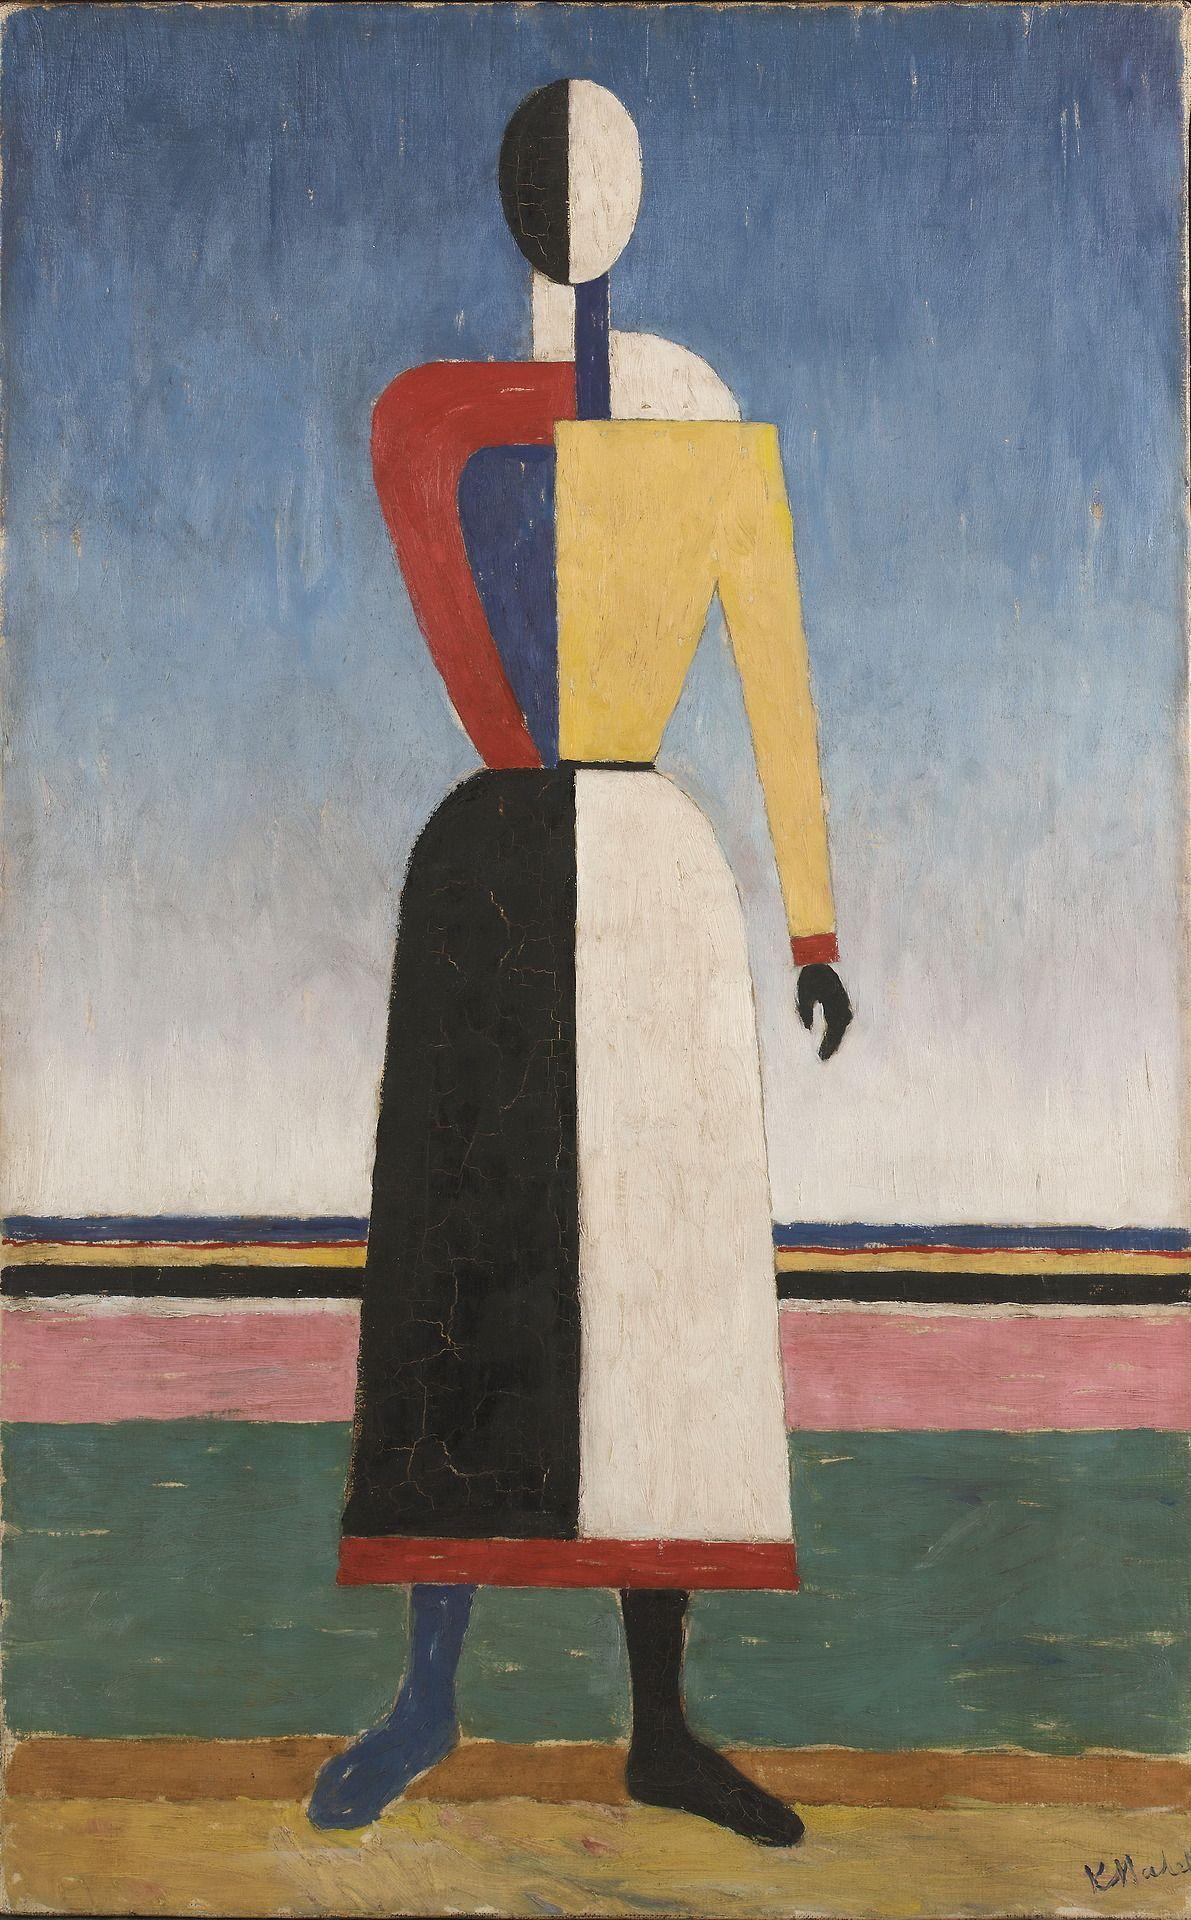 1932 KAZIMIR MALEVICH Russian Avant-Garde Suprematist Poster Female Figure